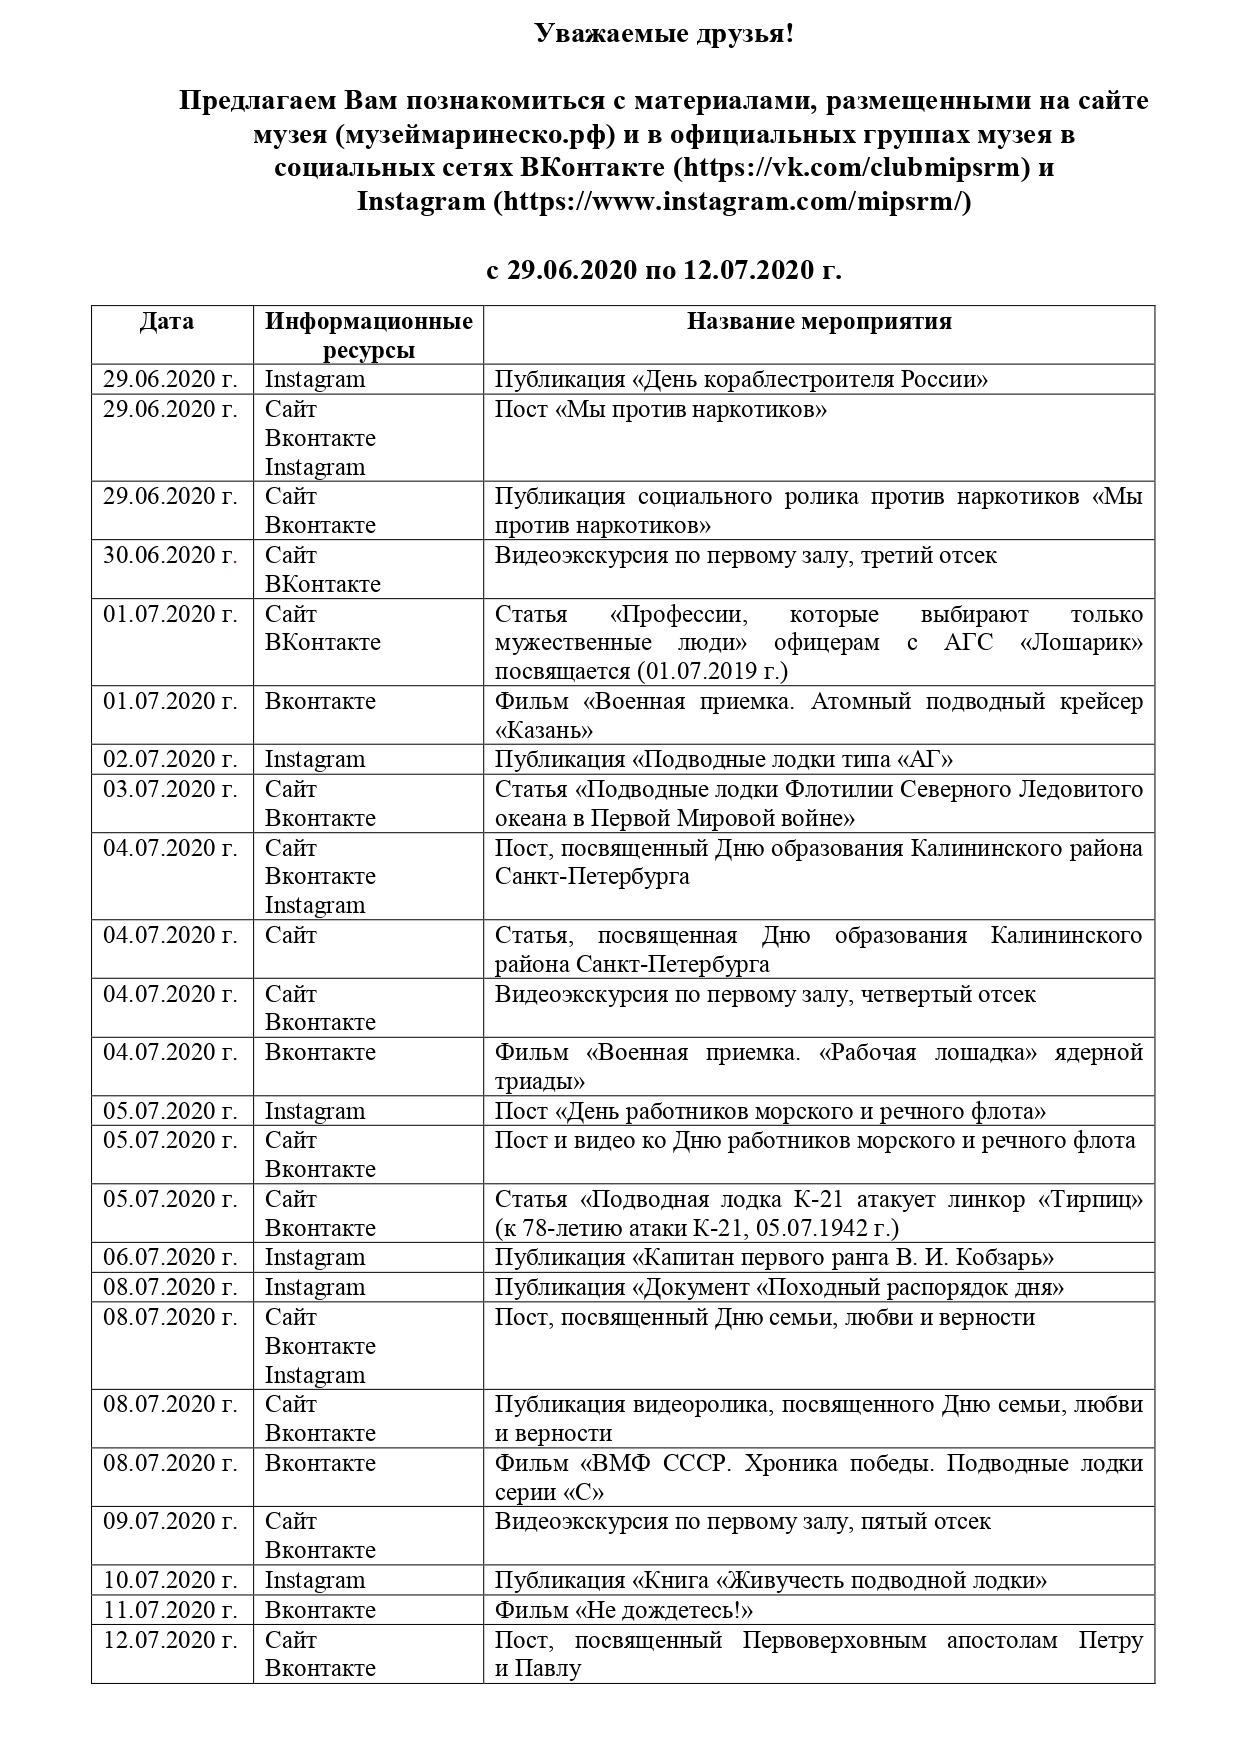 Афиша с 29.06.2020 по 12.07.2020 года